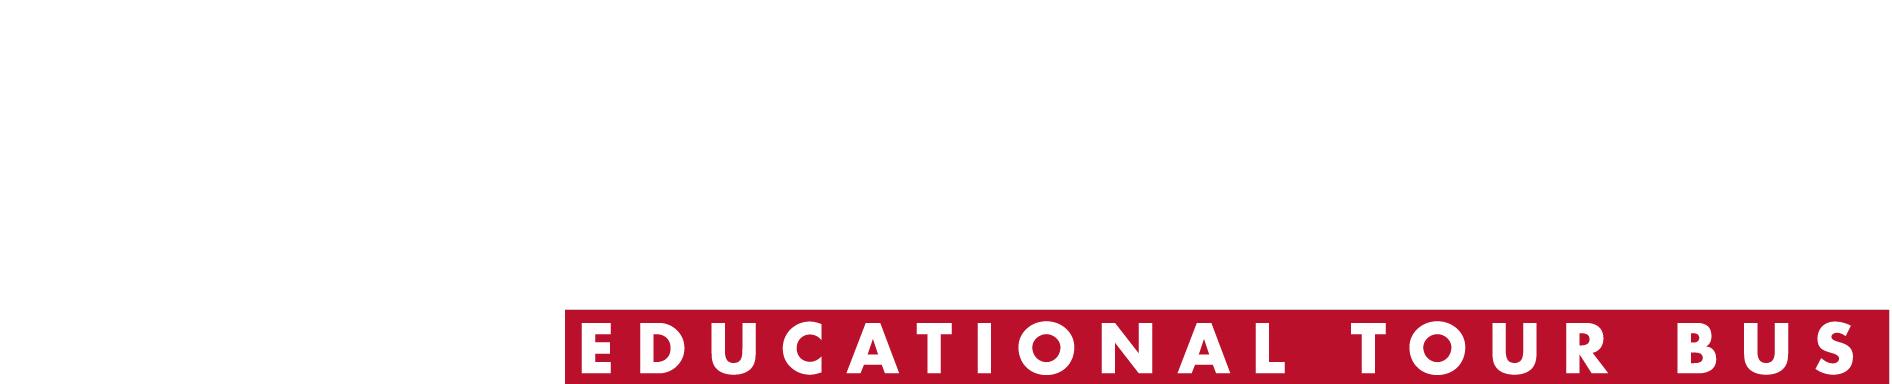 The John Lennon Educational Bus